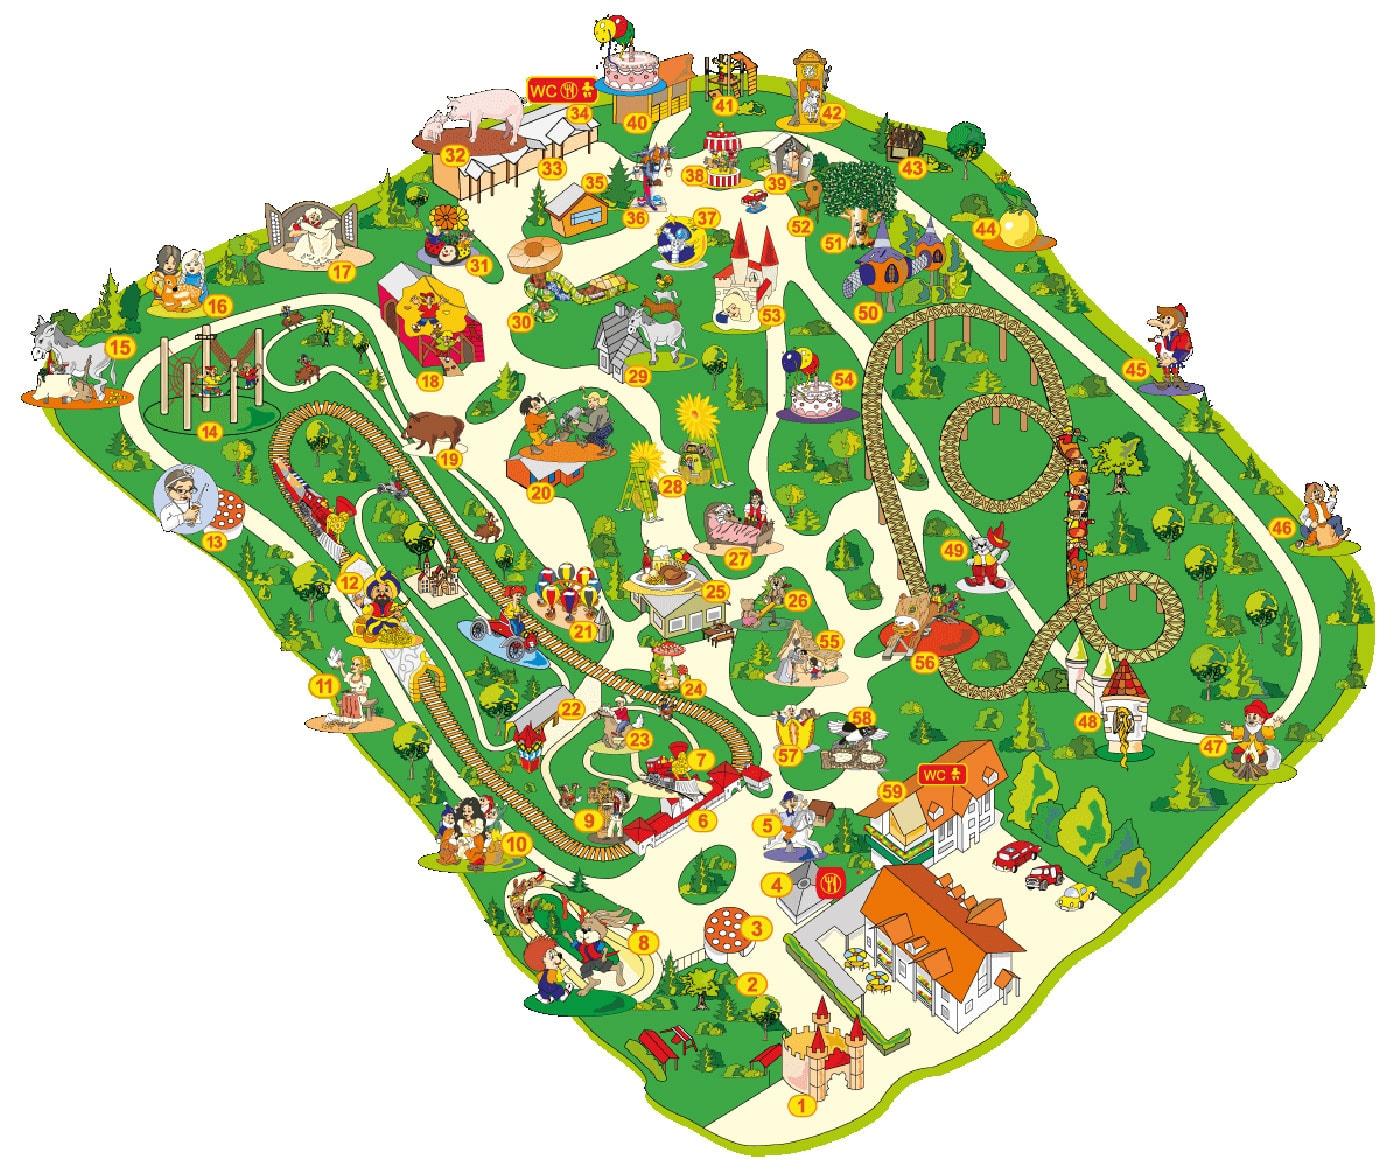 Ausflugsziel stadtnah: Märchenwald im Isartal // HIMBEER